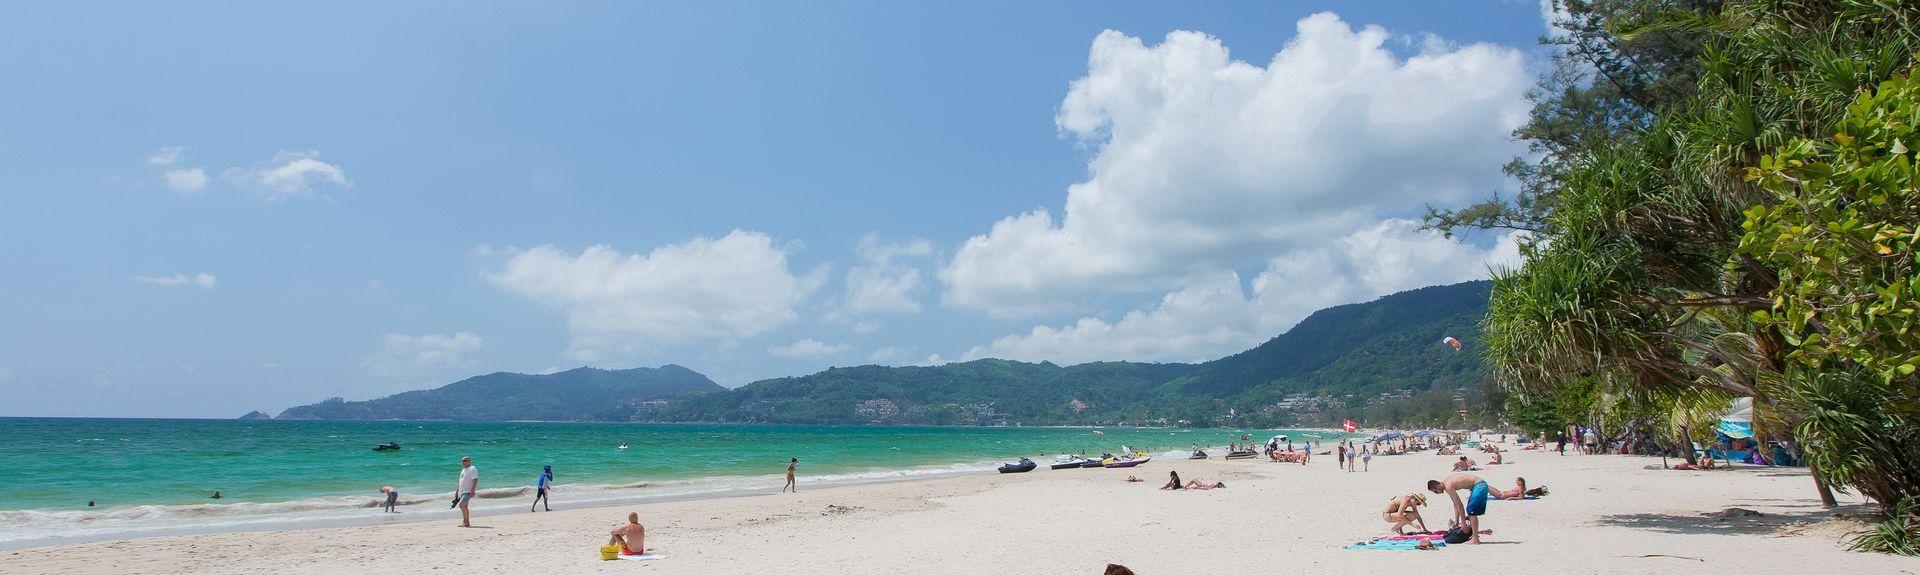 Kata Beach, Karon, Phuket (provins), Thailand